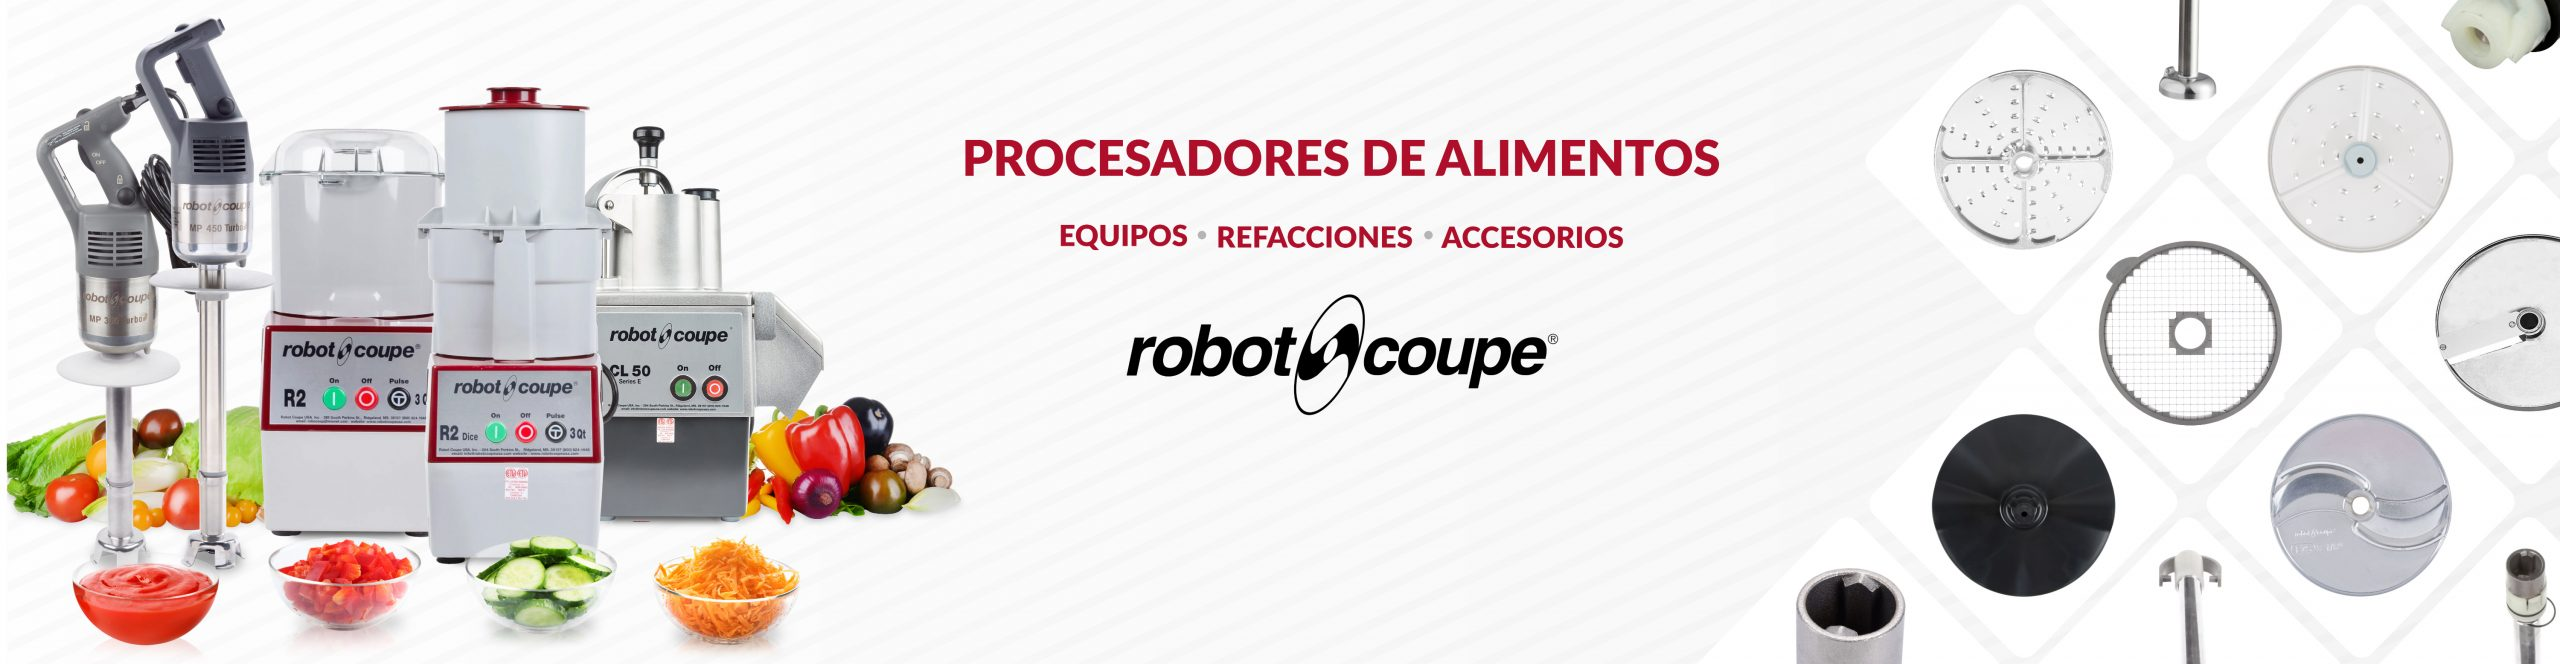 robot coupe equipos